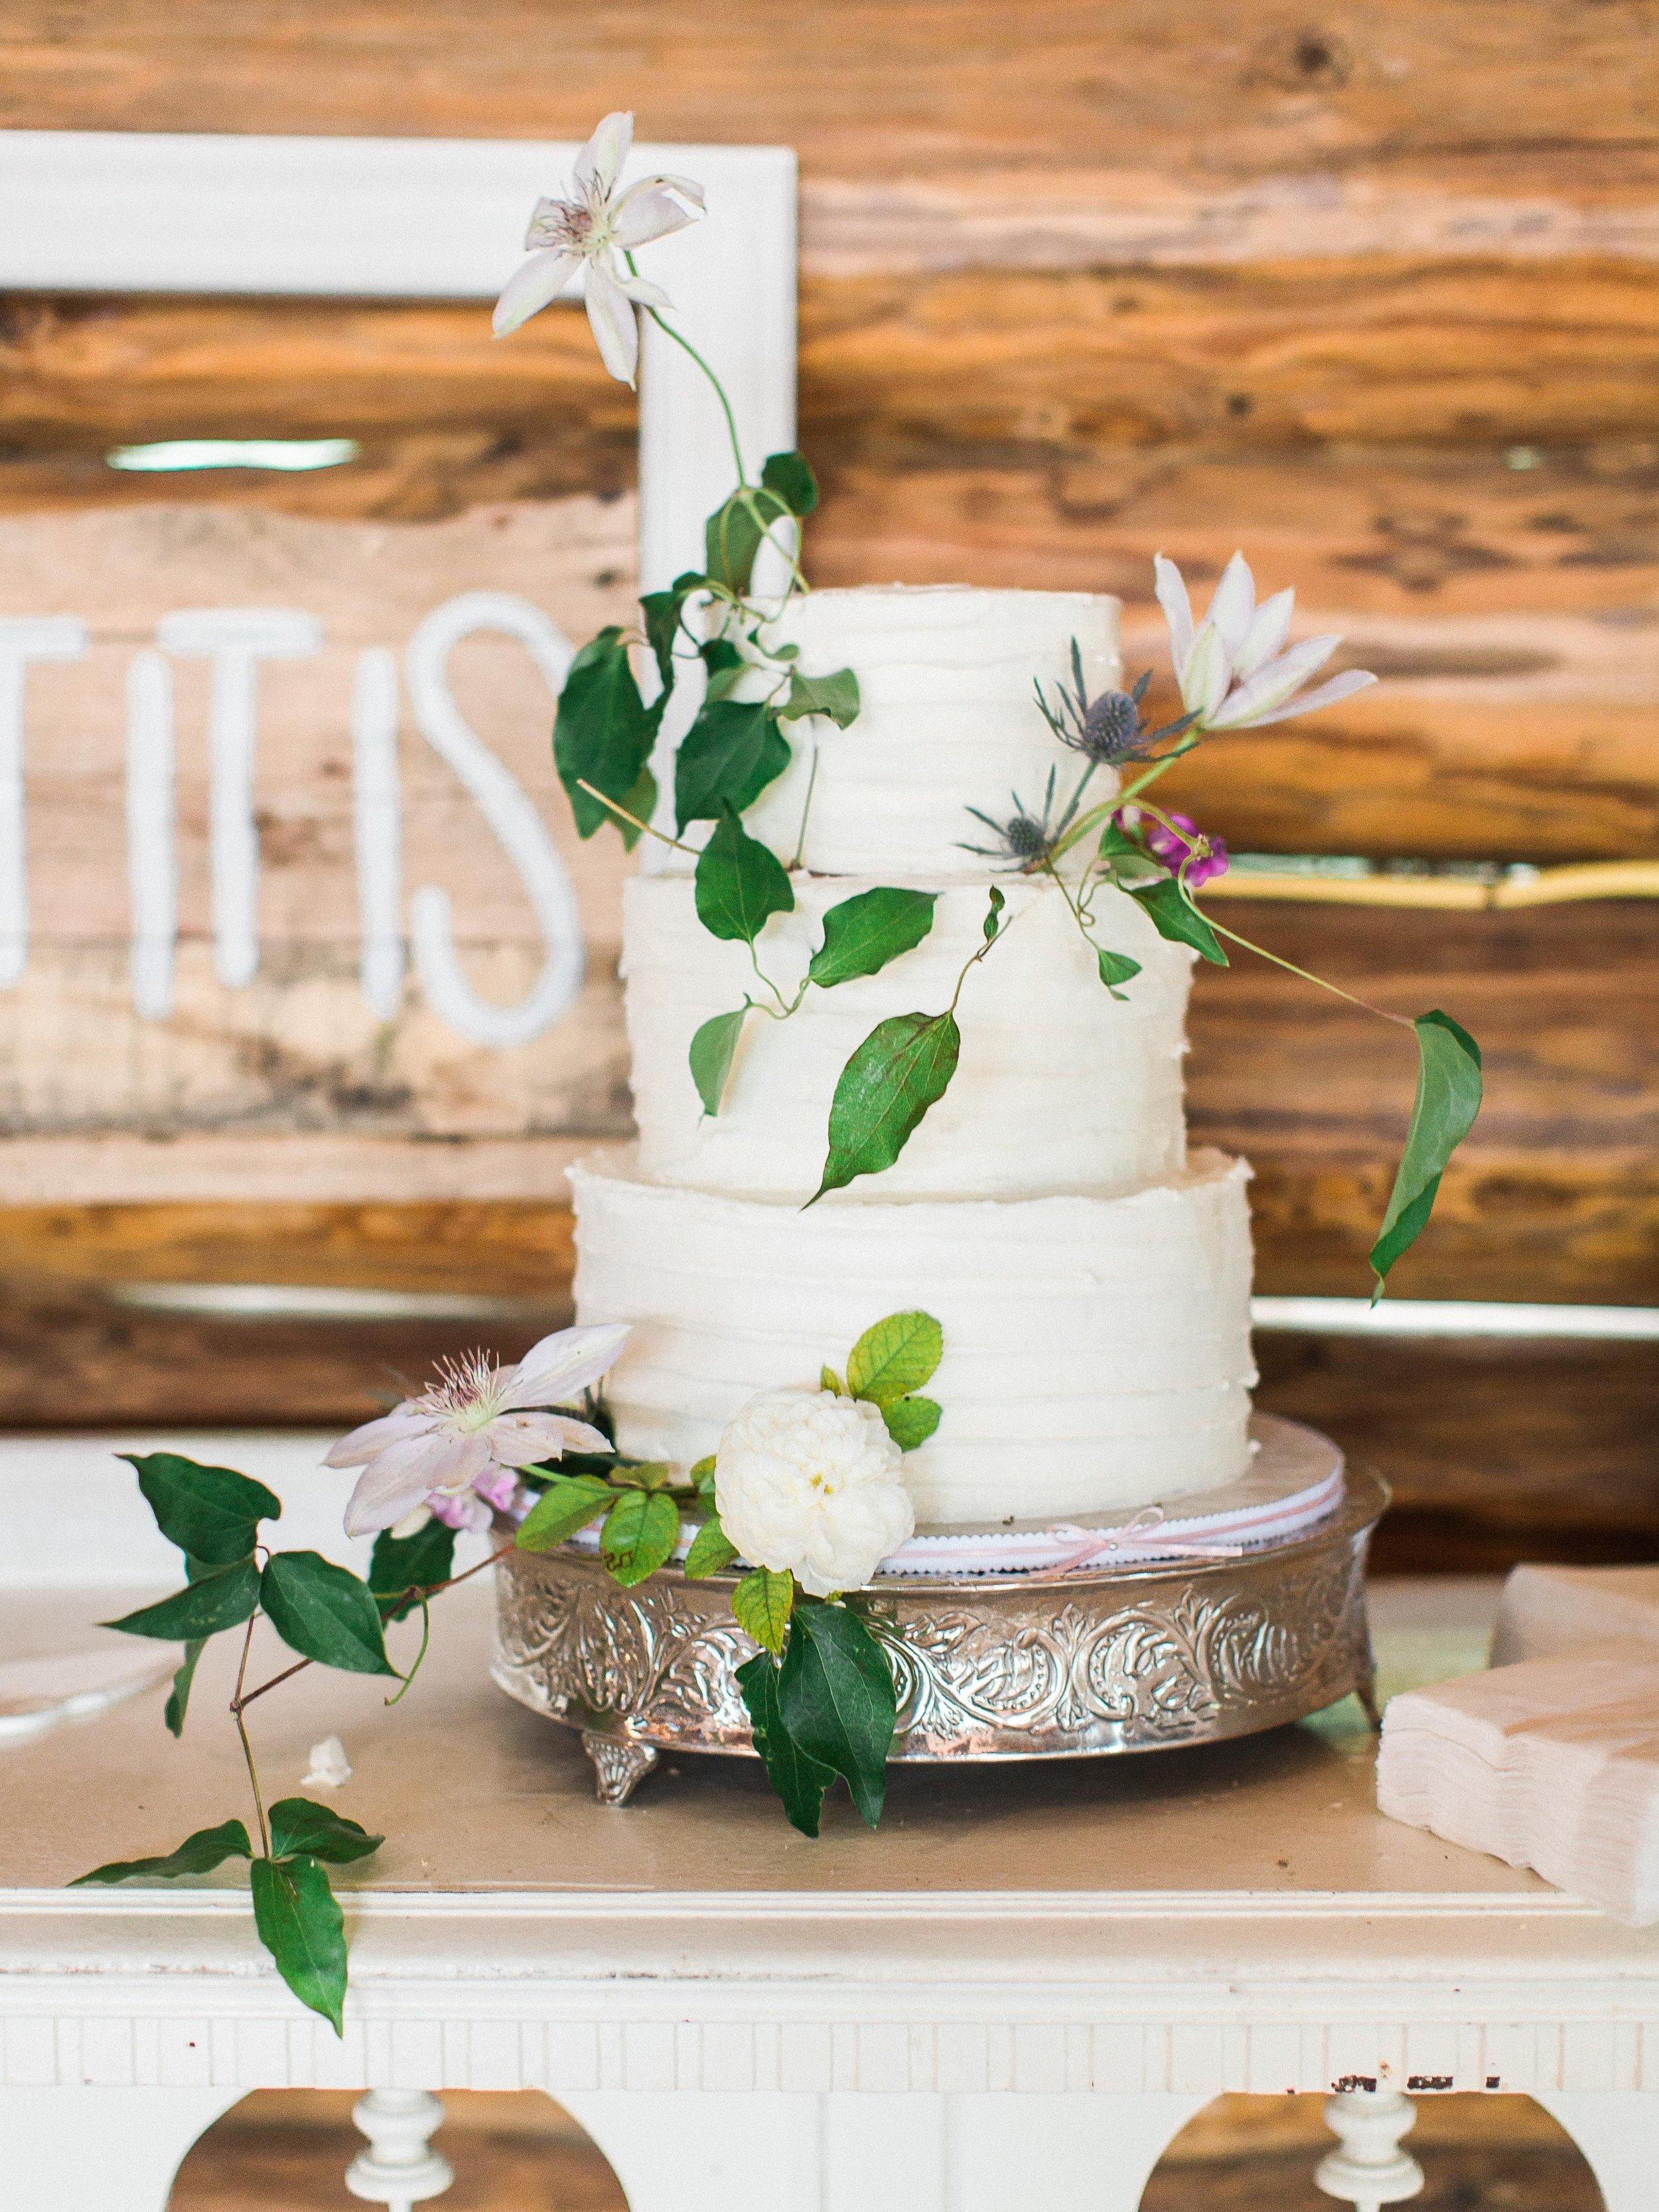 ERIC AND HALLIE WEDDING-HI RESOLUTION FOR PRINTING-0826.jpg